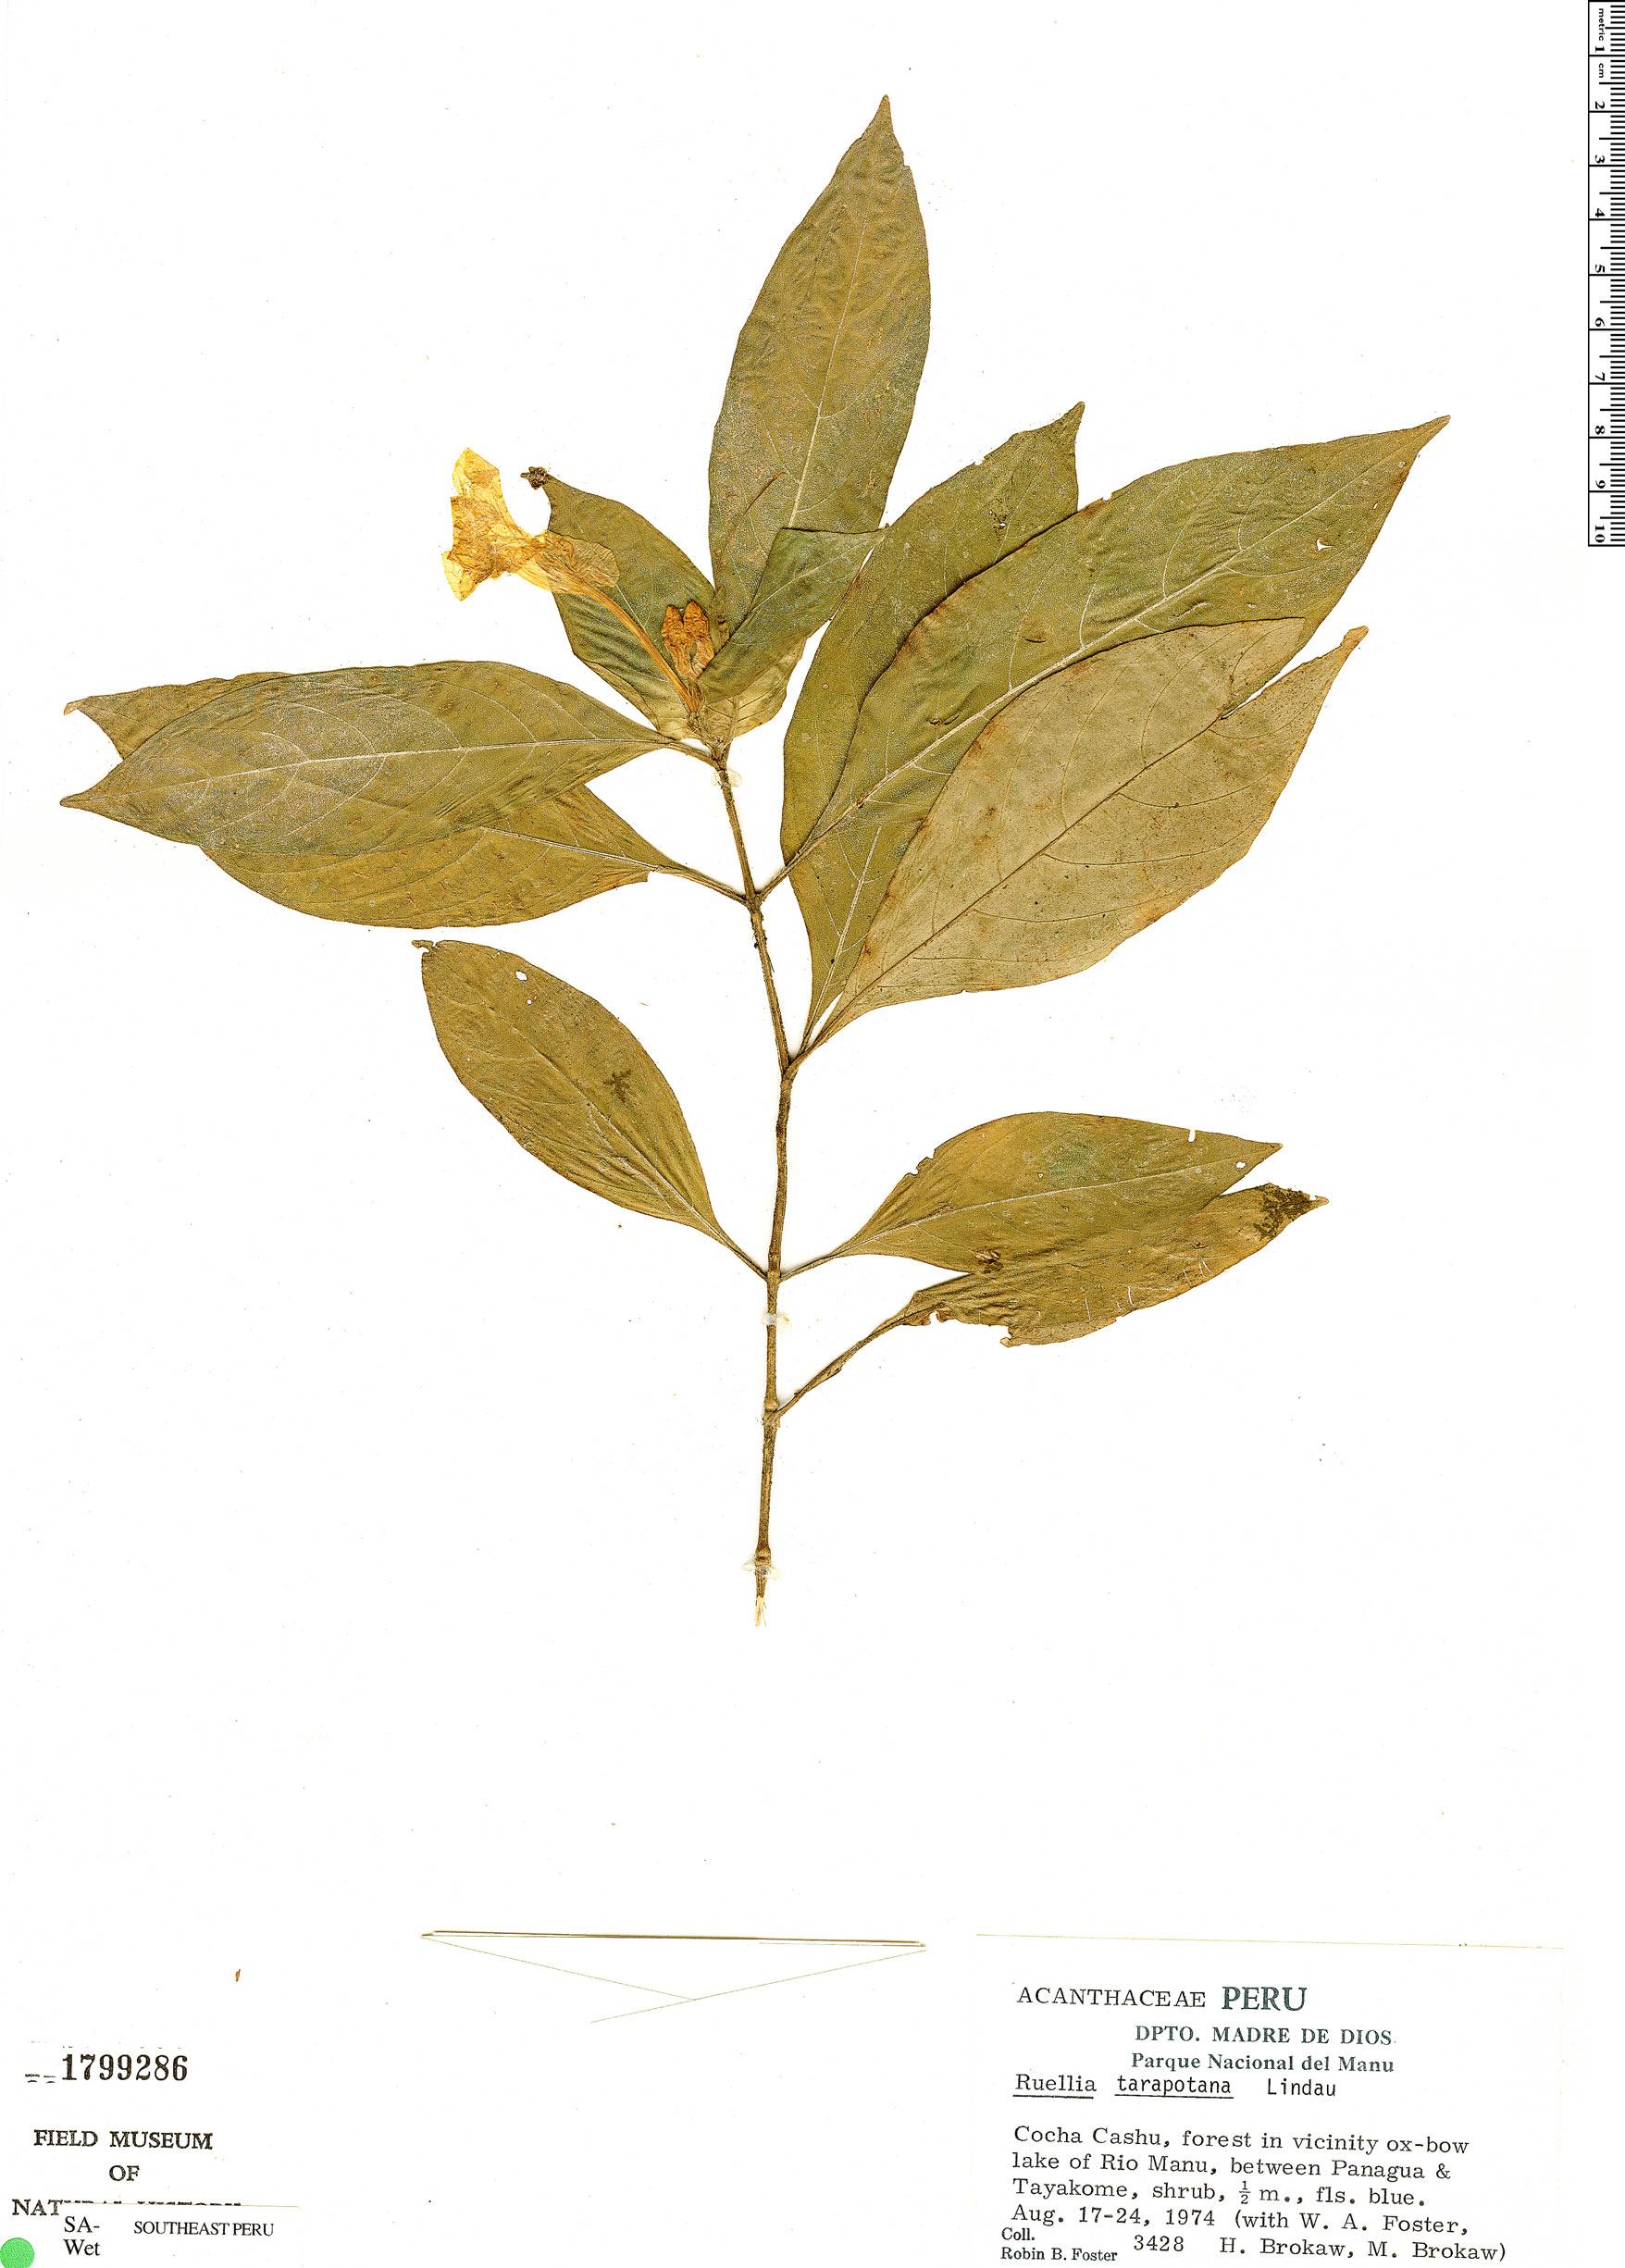 Specimen: Ruellia tarapotana